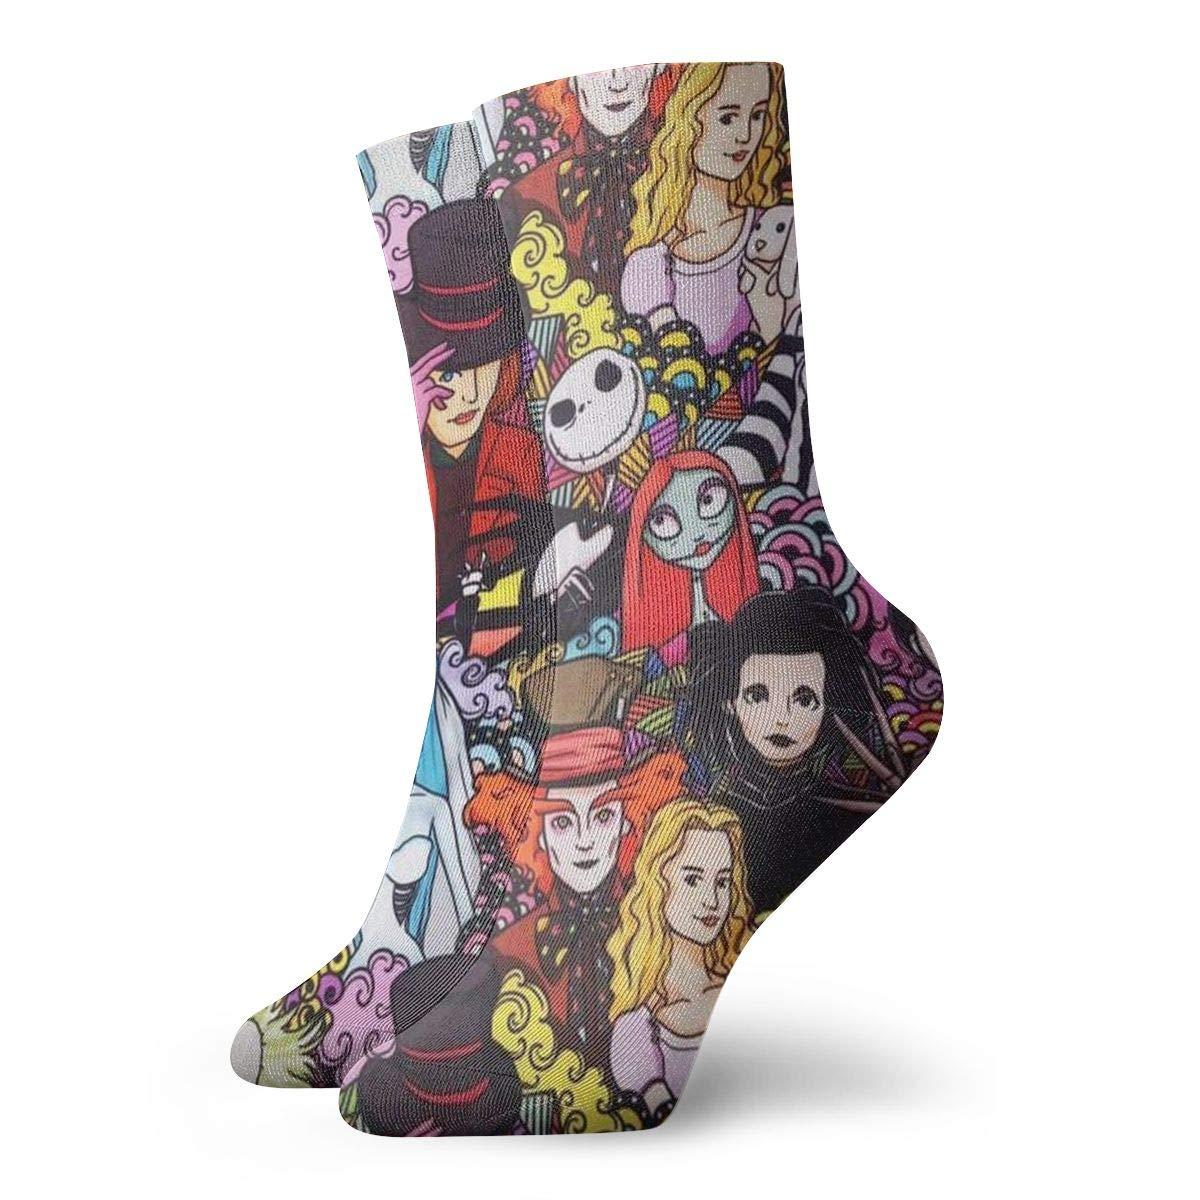 Cartoon Figure Unisex Funny Casual Crew Socks Athletic Socks For Boys Girls Kids Teenagers